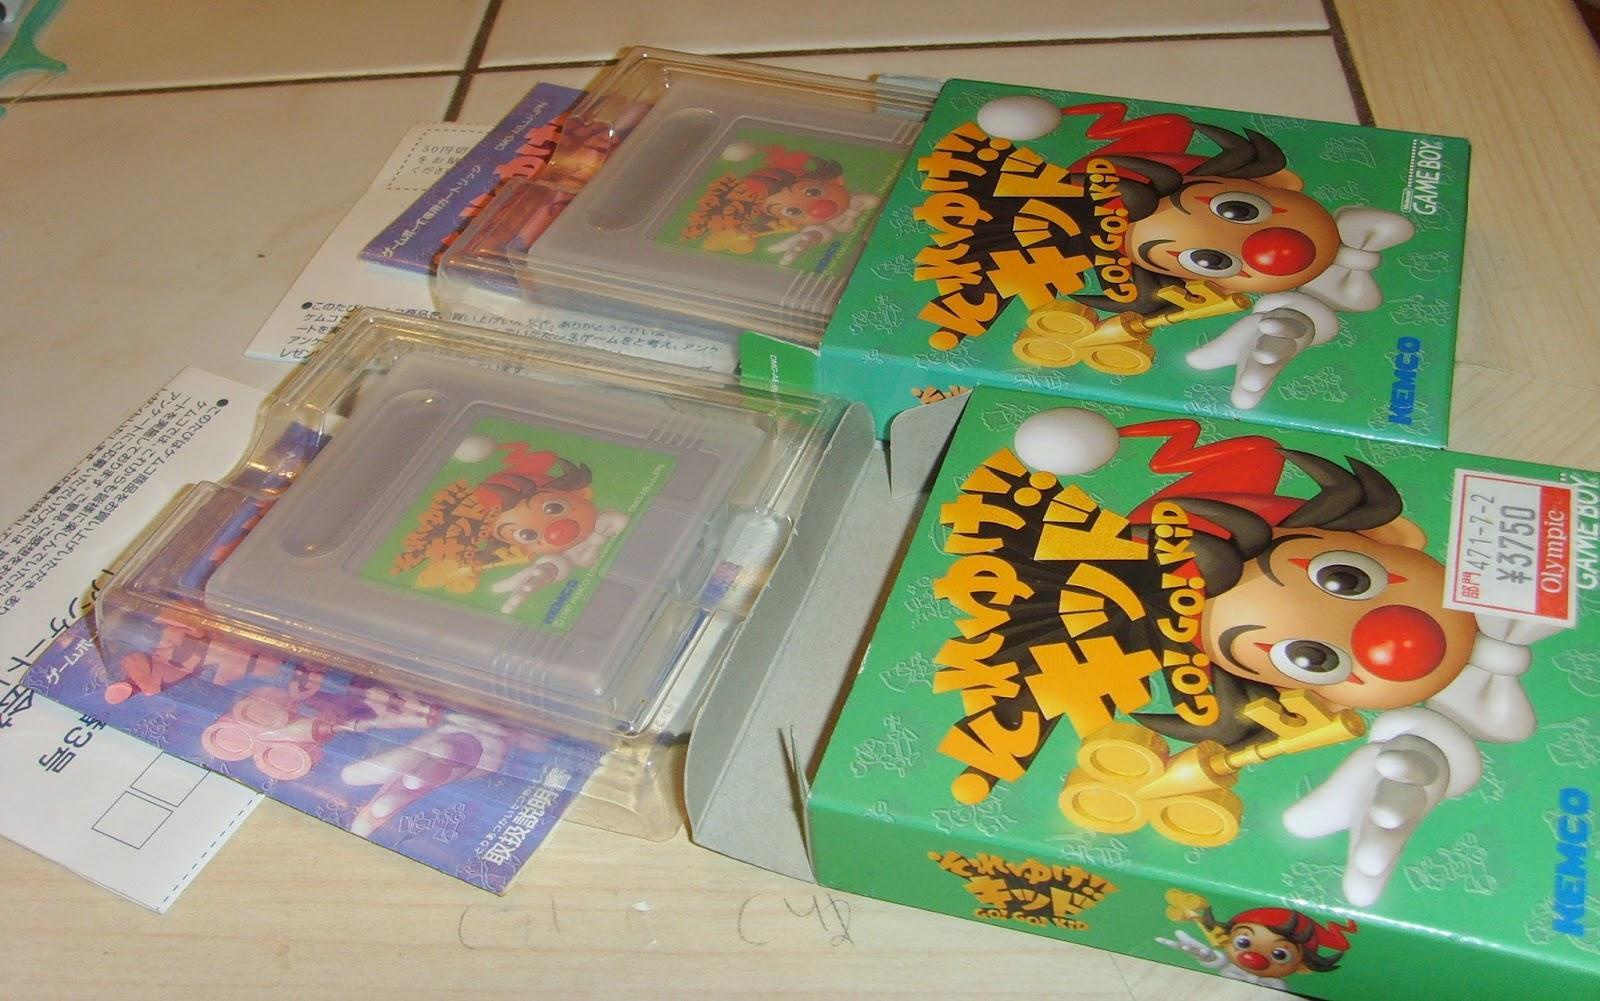 Japanspel Blog: Soreyuke!! Kid and Mickey Mouse (Bugs Bunny